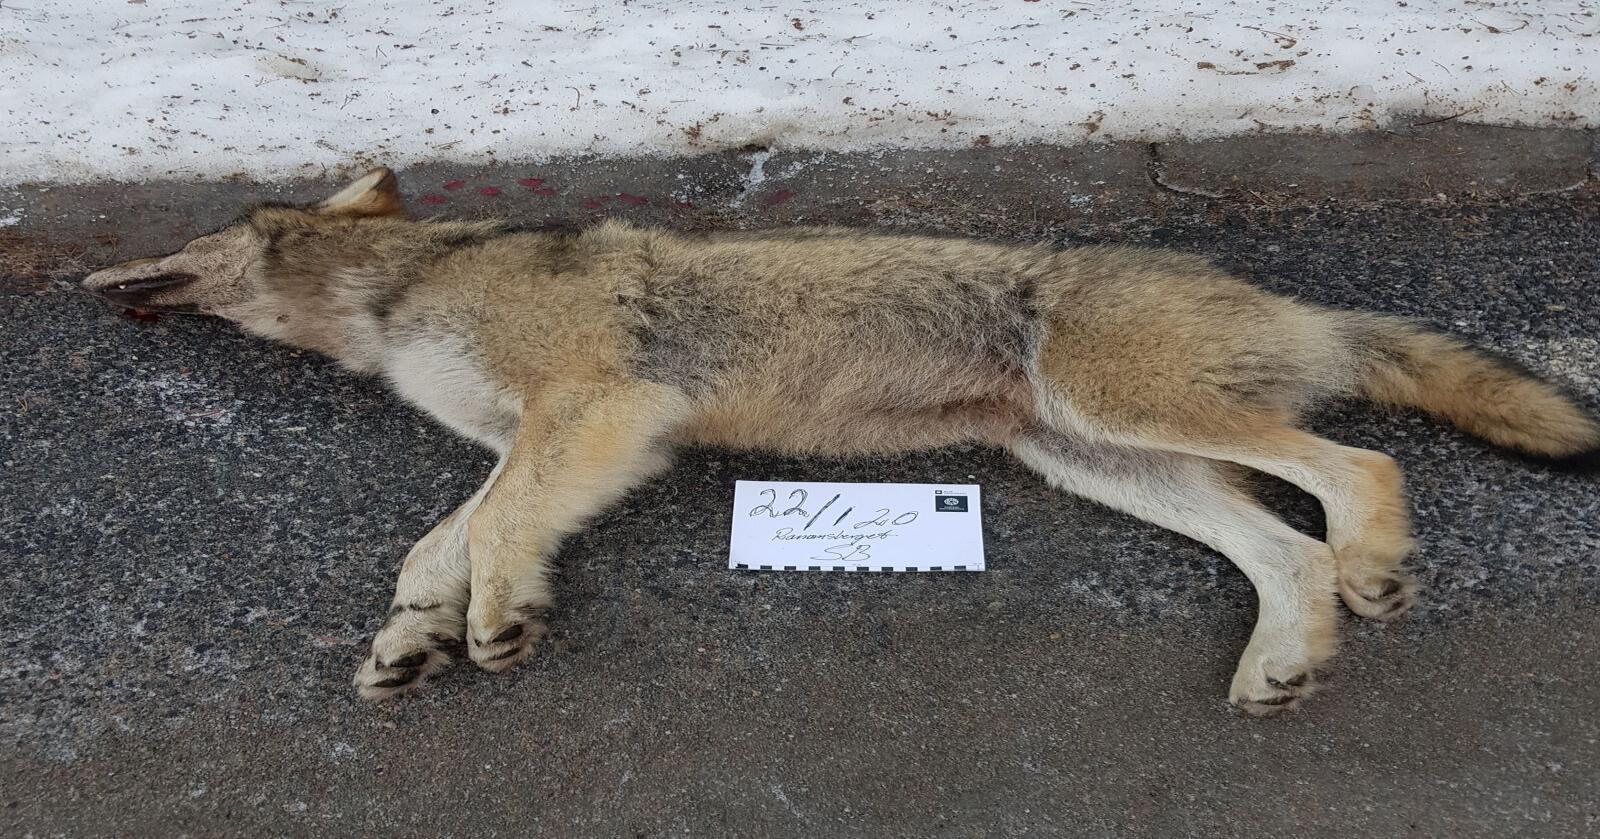 Denne ulven på 31 kilo ble påkjørt i Våler onsdag morgen. Foto: Statens Naturoppsyn / NTB scanpix